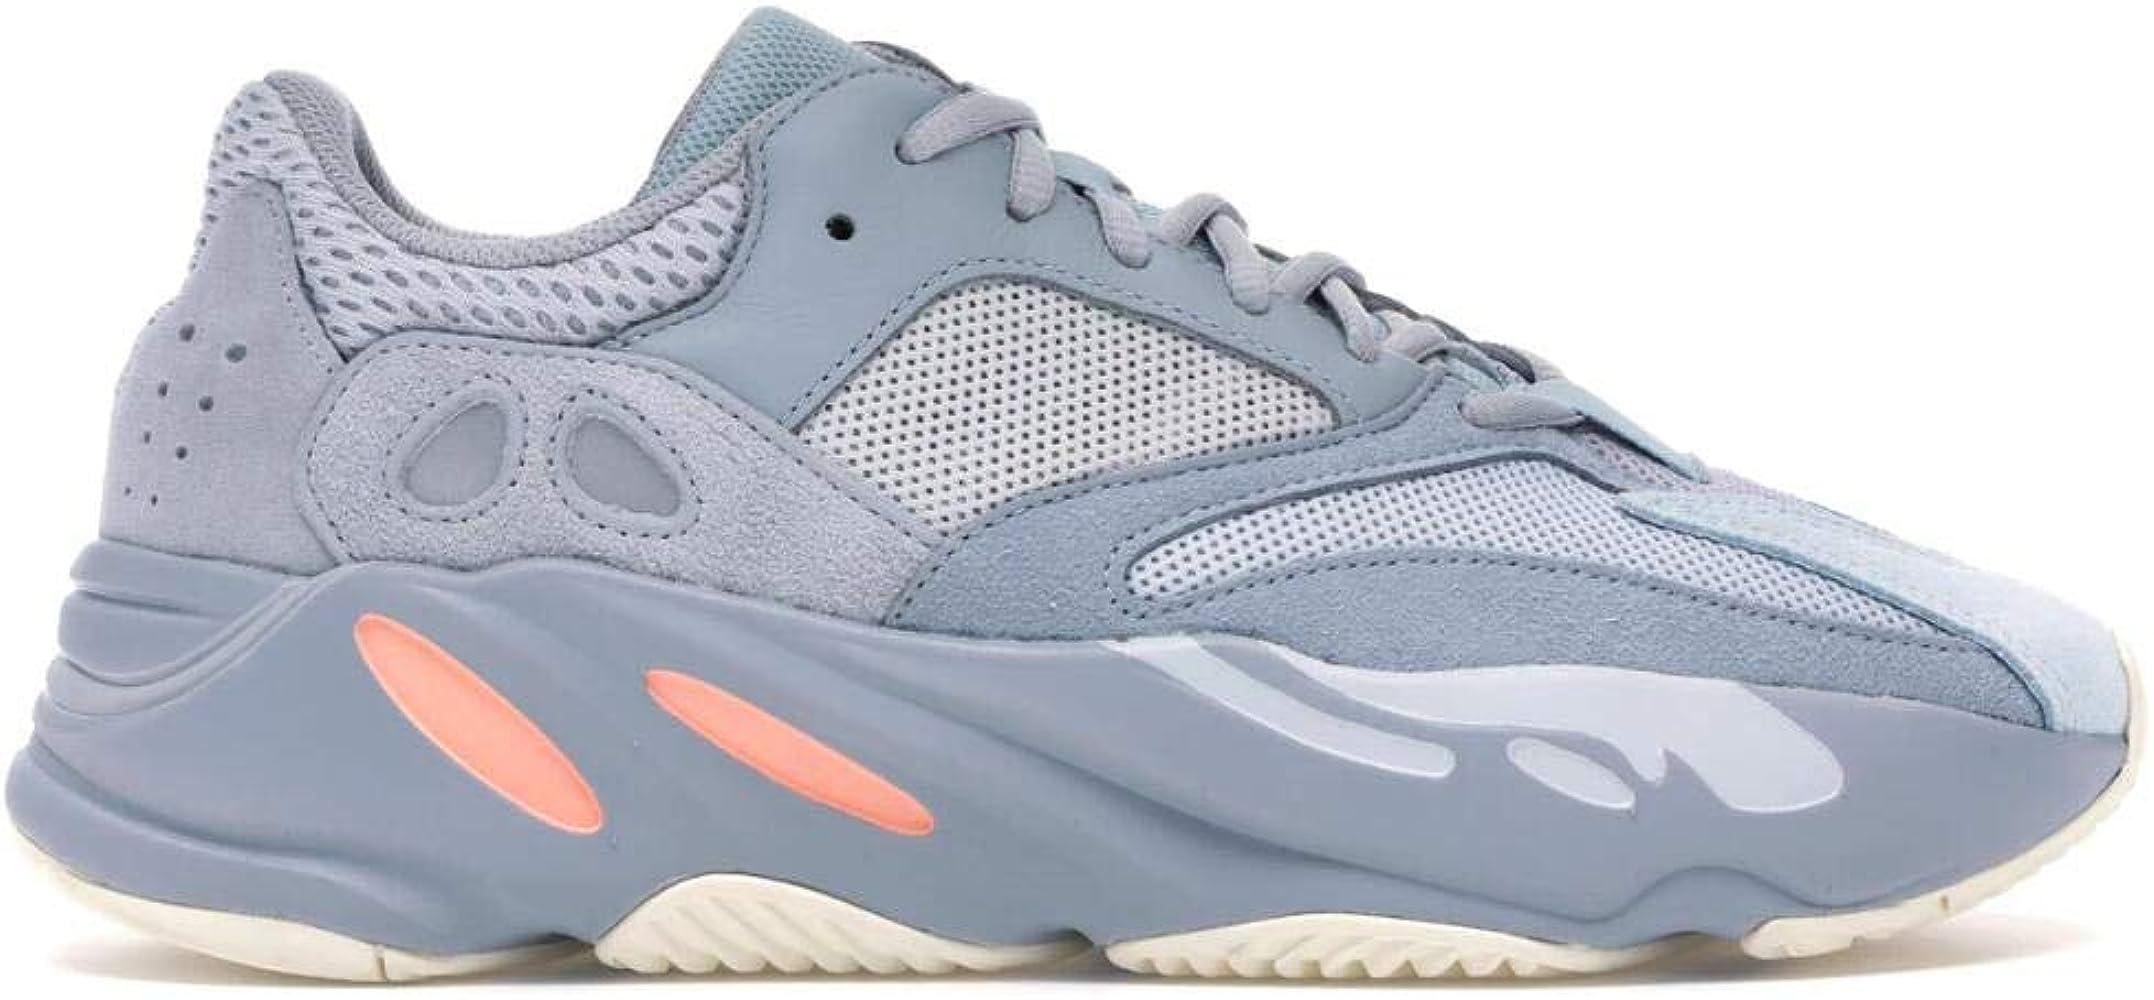 Yusheng EG7597 - Zapatillas de Running Unisex para Hombre y Mujer ...